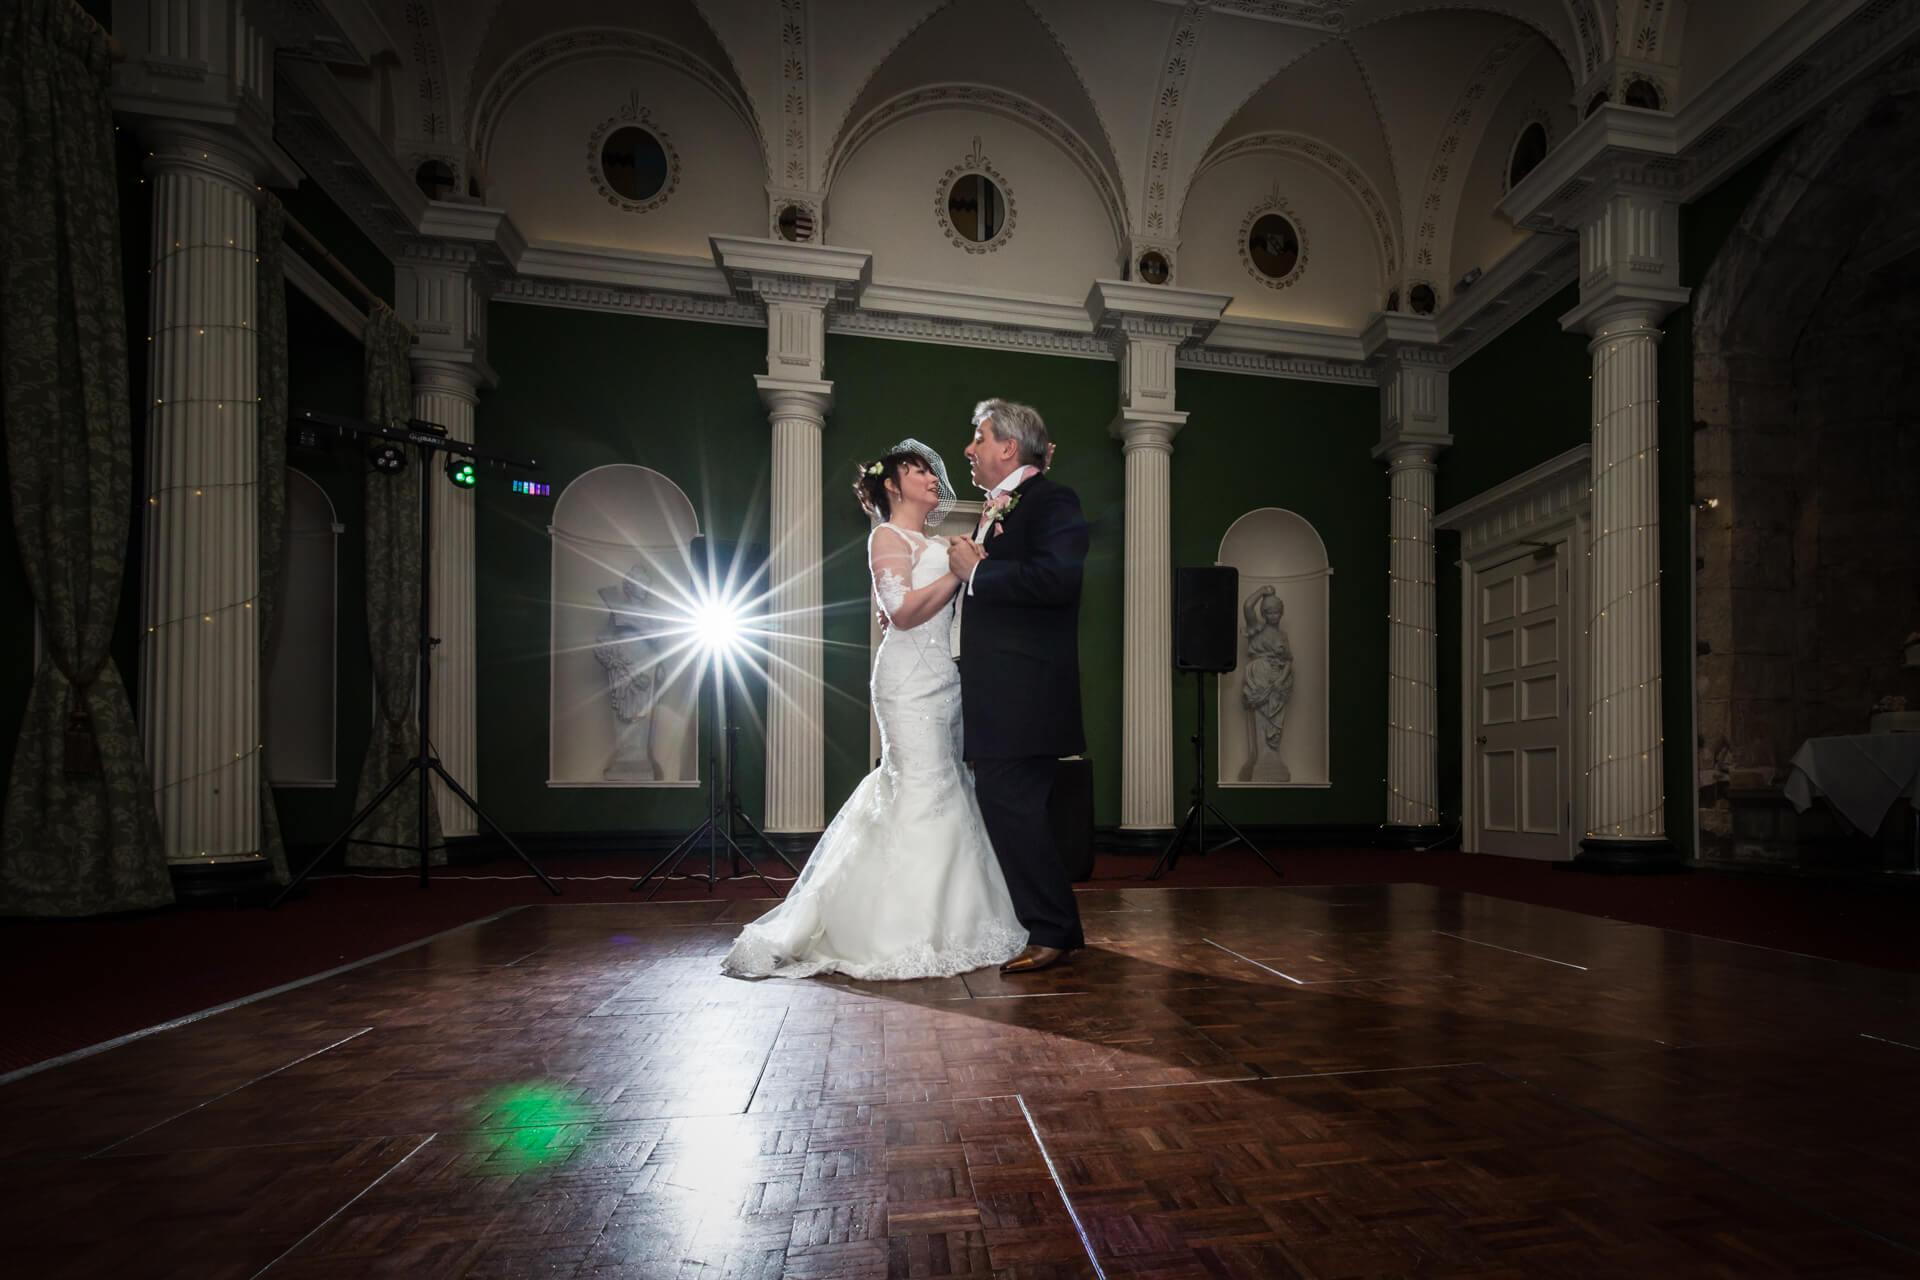 Hazlewood Castle wedding photographer - wedding couple's first dance